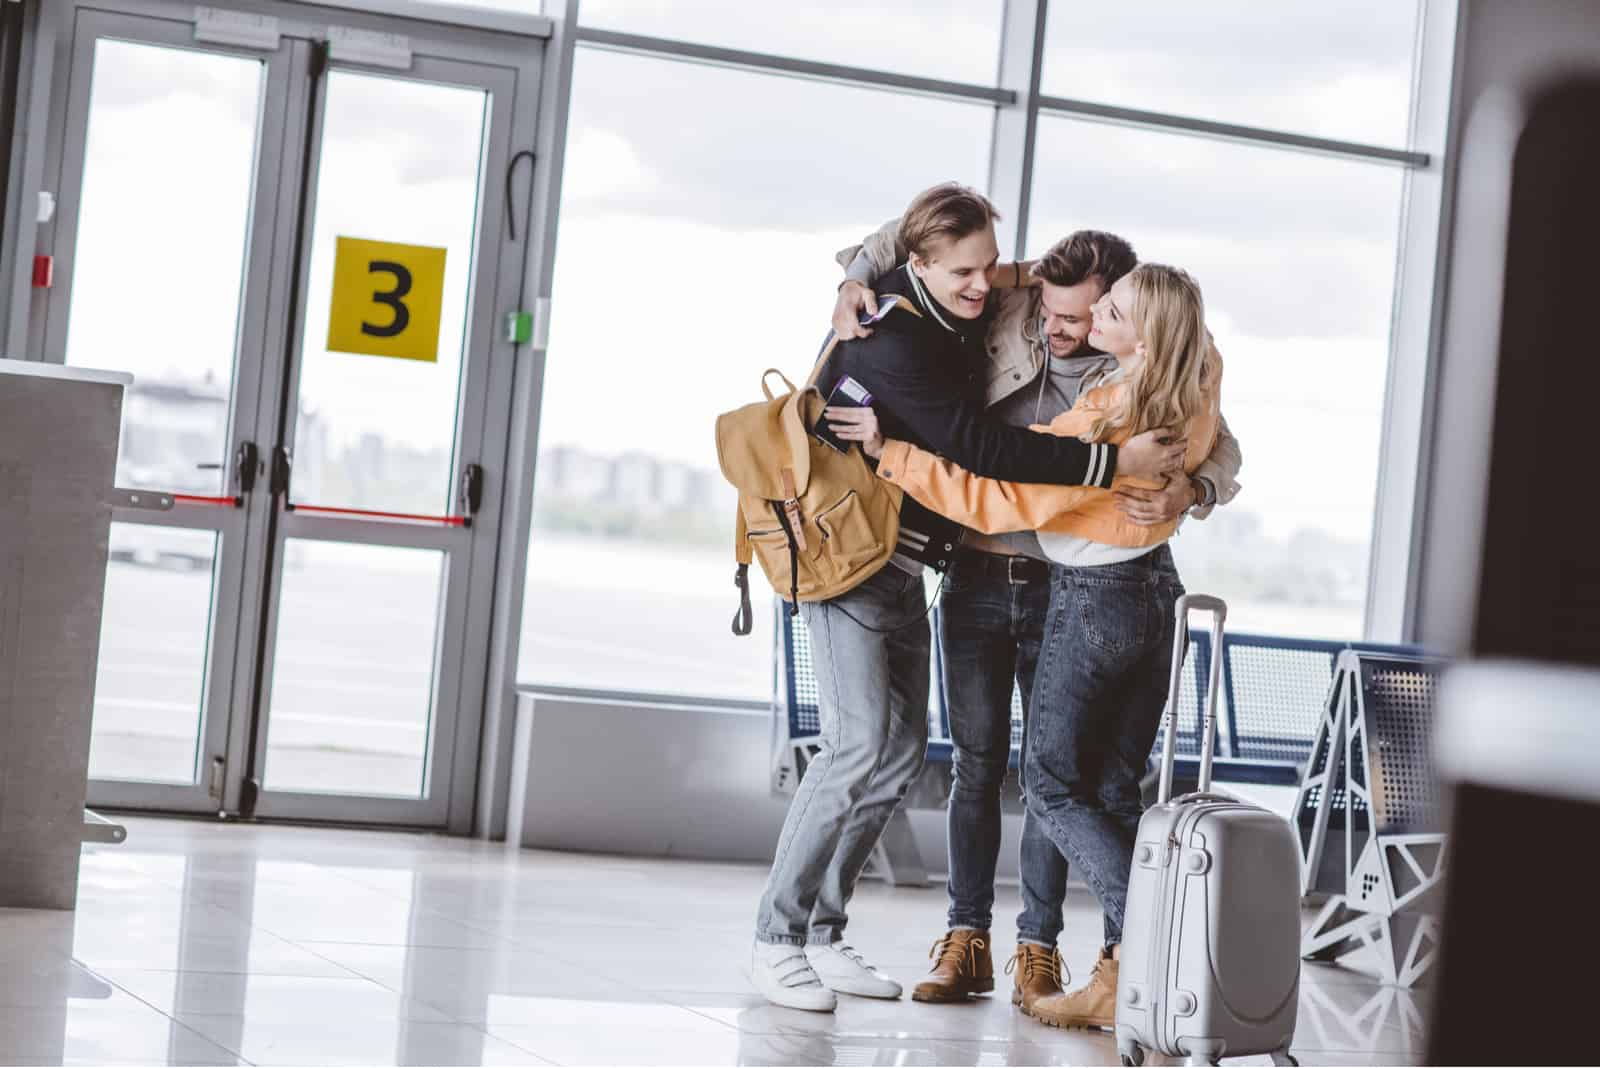 Freunde am Flughafen umarmen